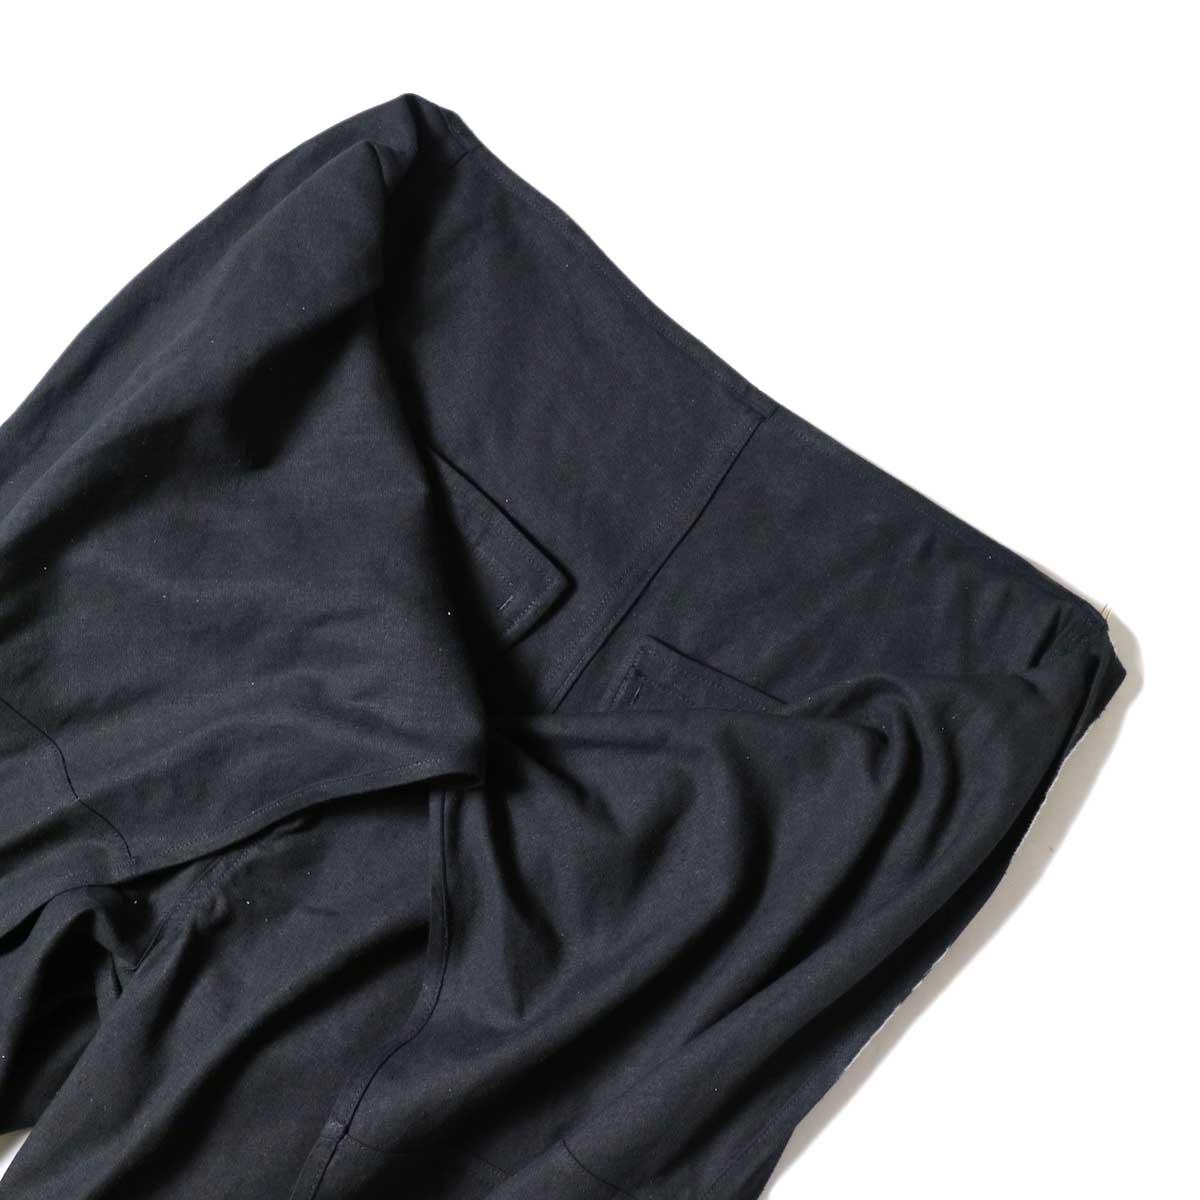 ARCHI / S/L NEP WRAP SLACKS (Black) ウエスト開閉